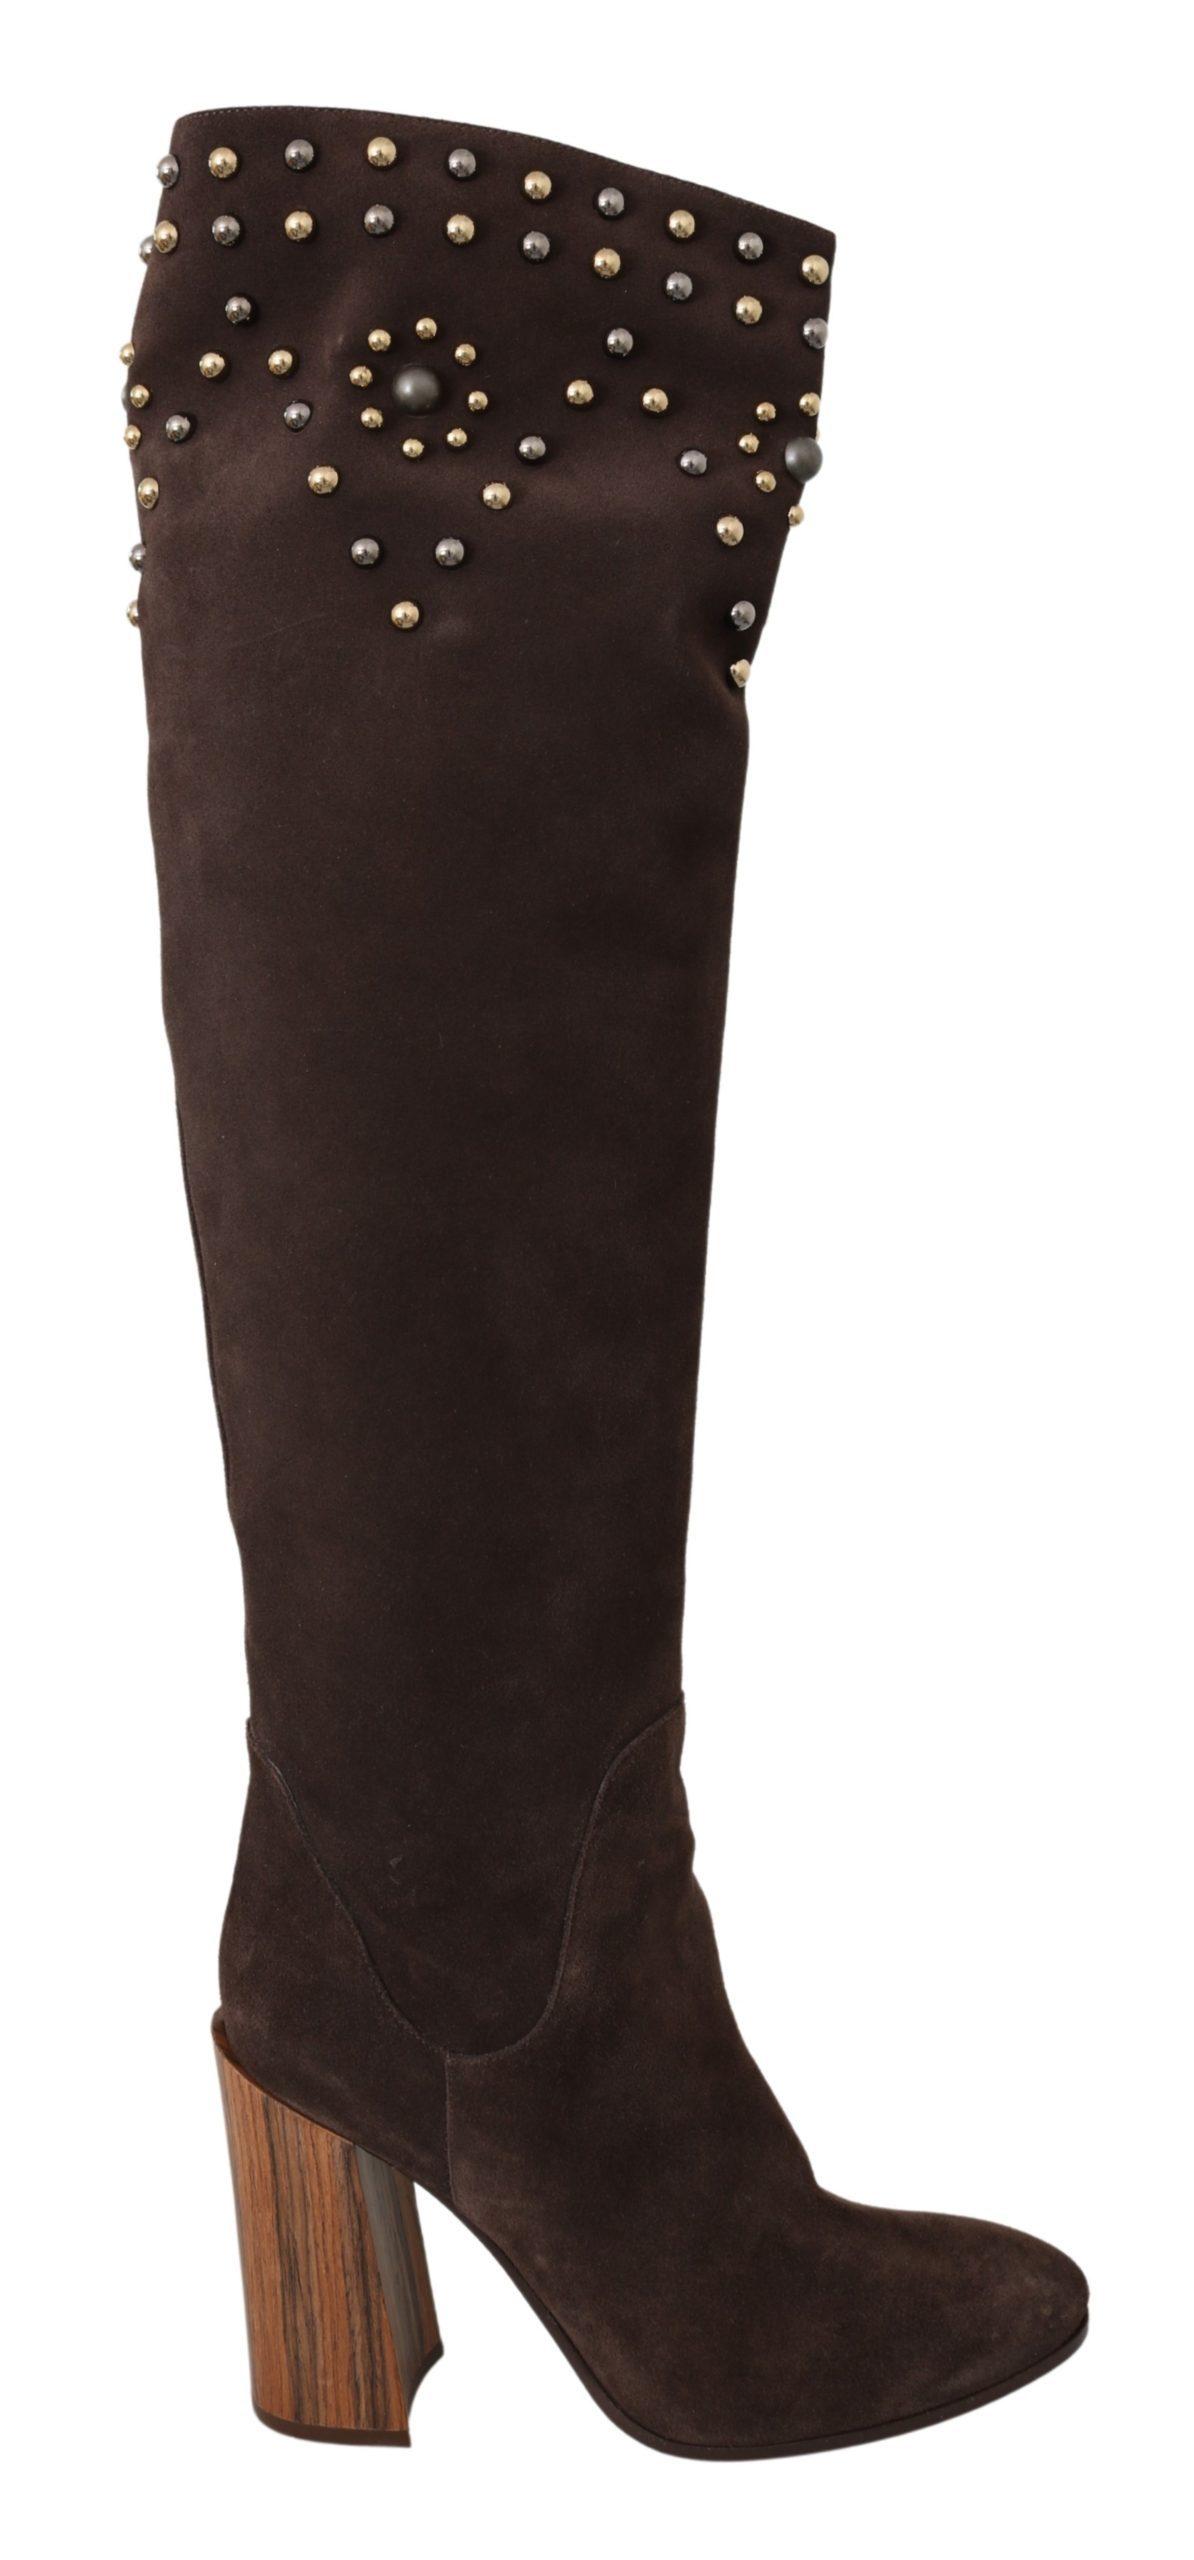 Dolce & Gabbana Women'sSuede Studded Knee High Boot Brown LA7086 - EU39/US8.5